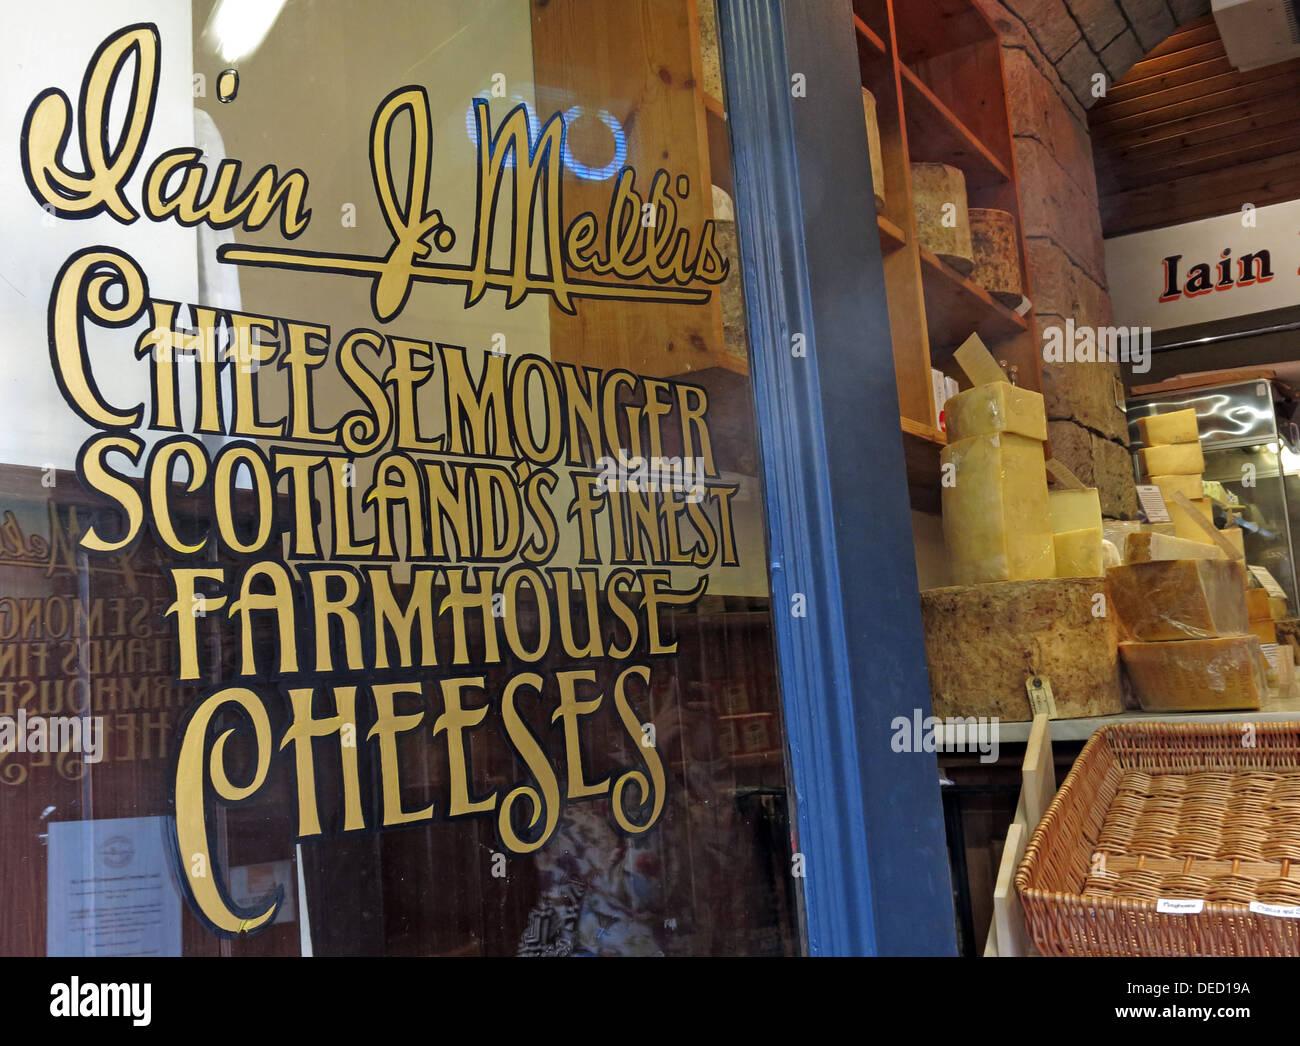 Iain Mellis Cheesemaker, Victoria St,Edinburgh,Scotland,Uk Stock Photo